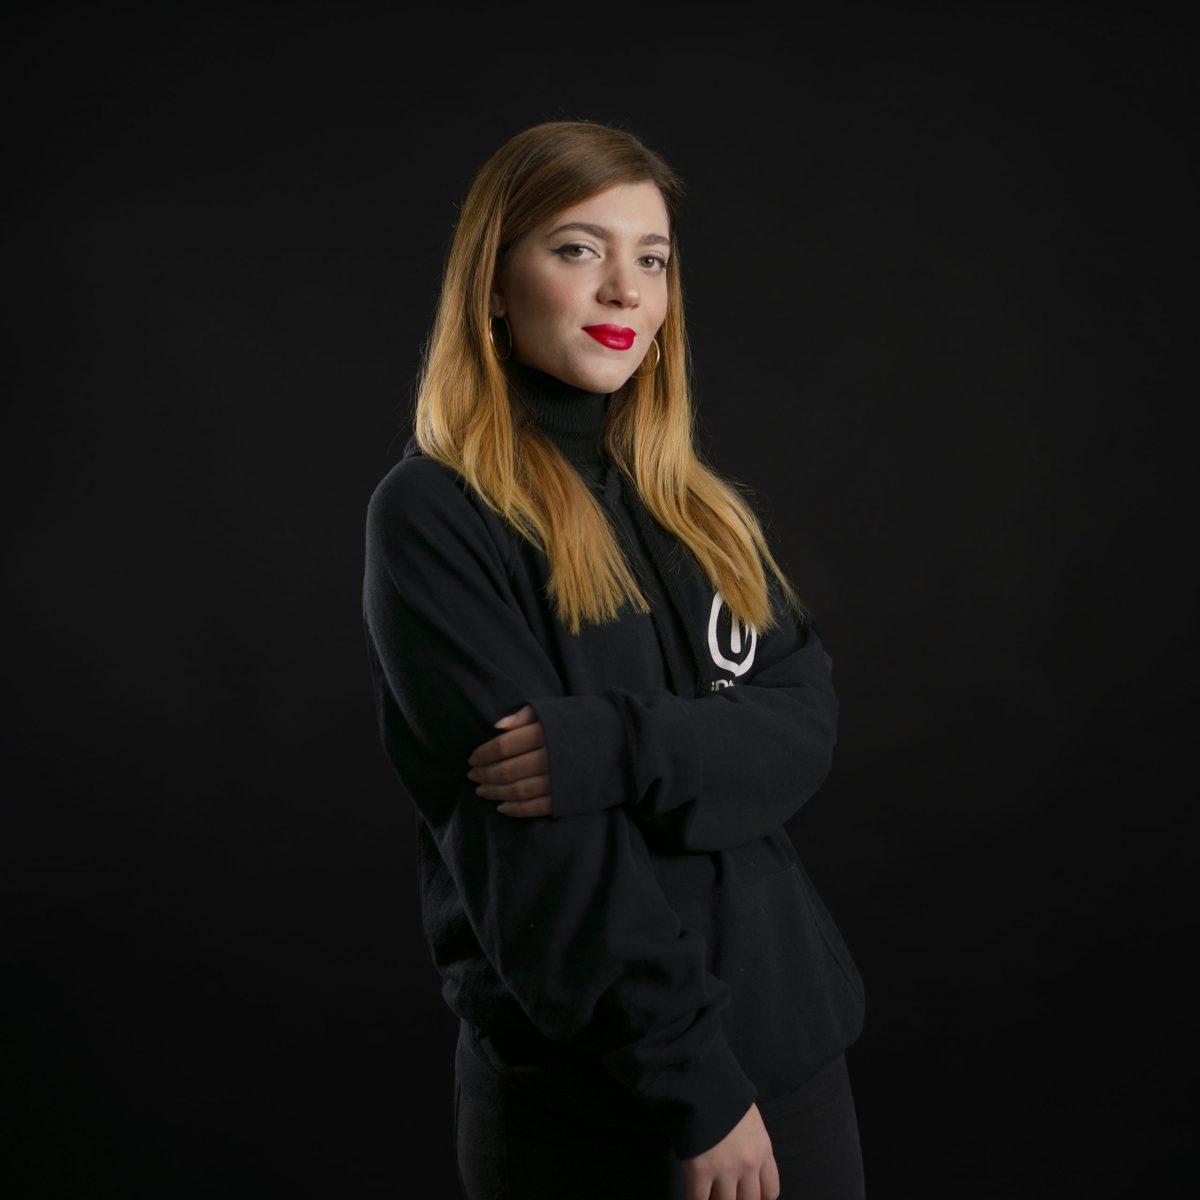 Alice Tomasini